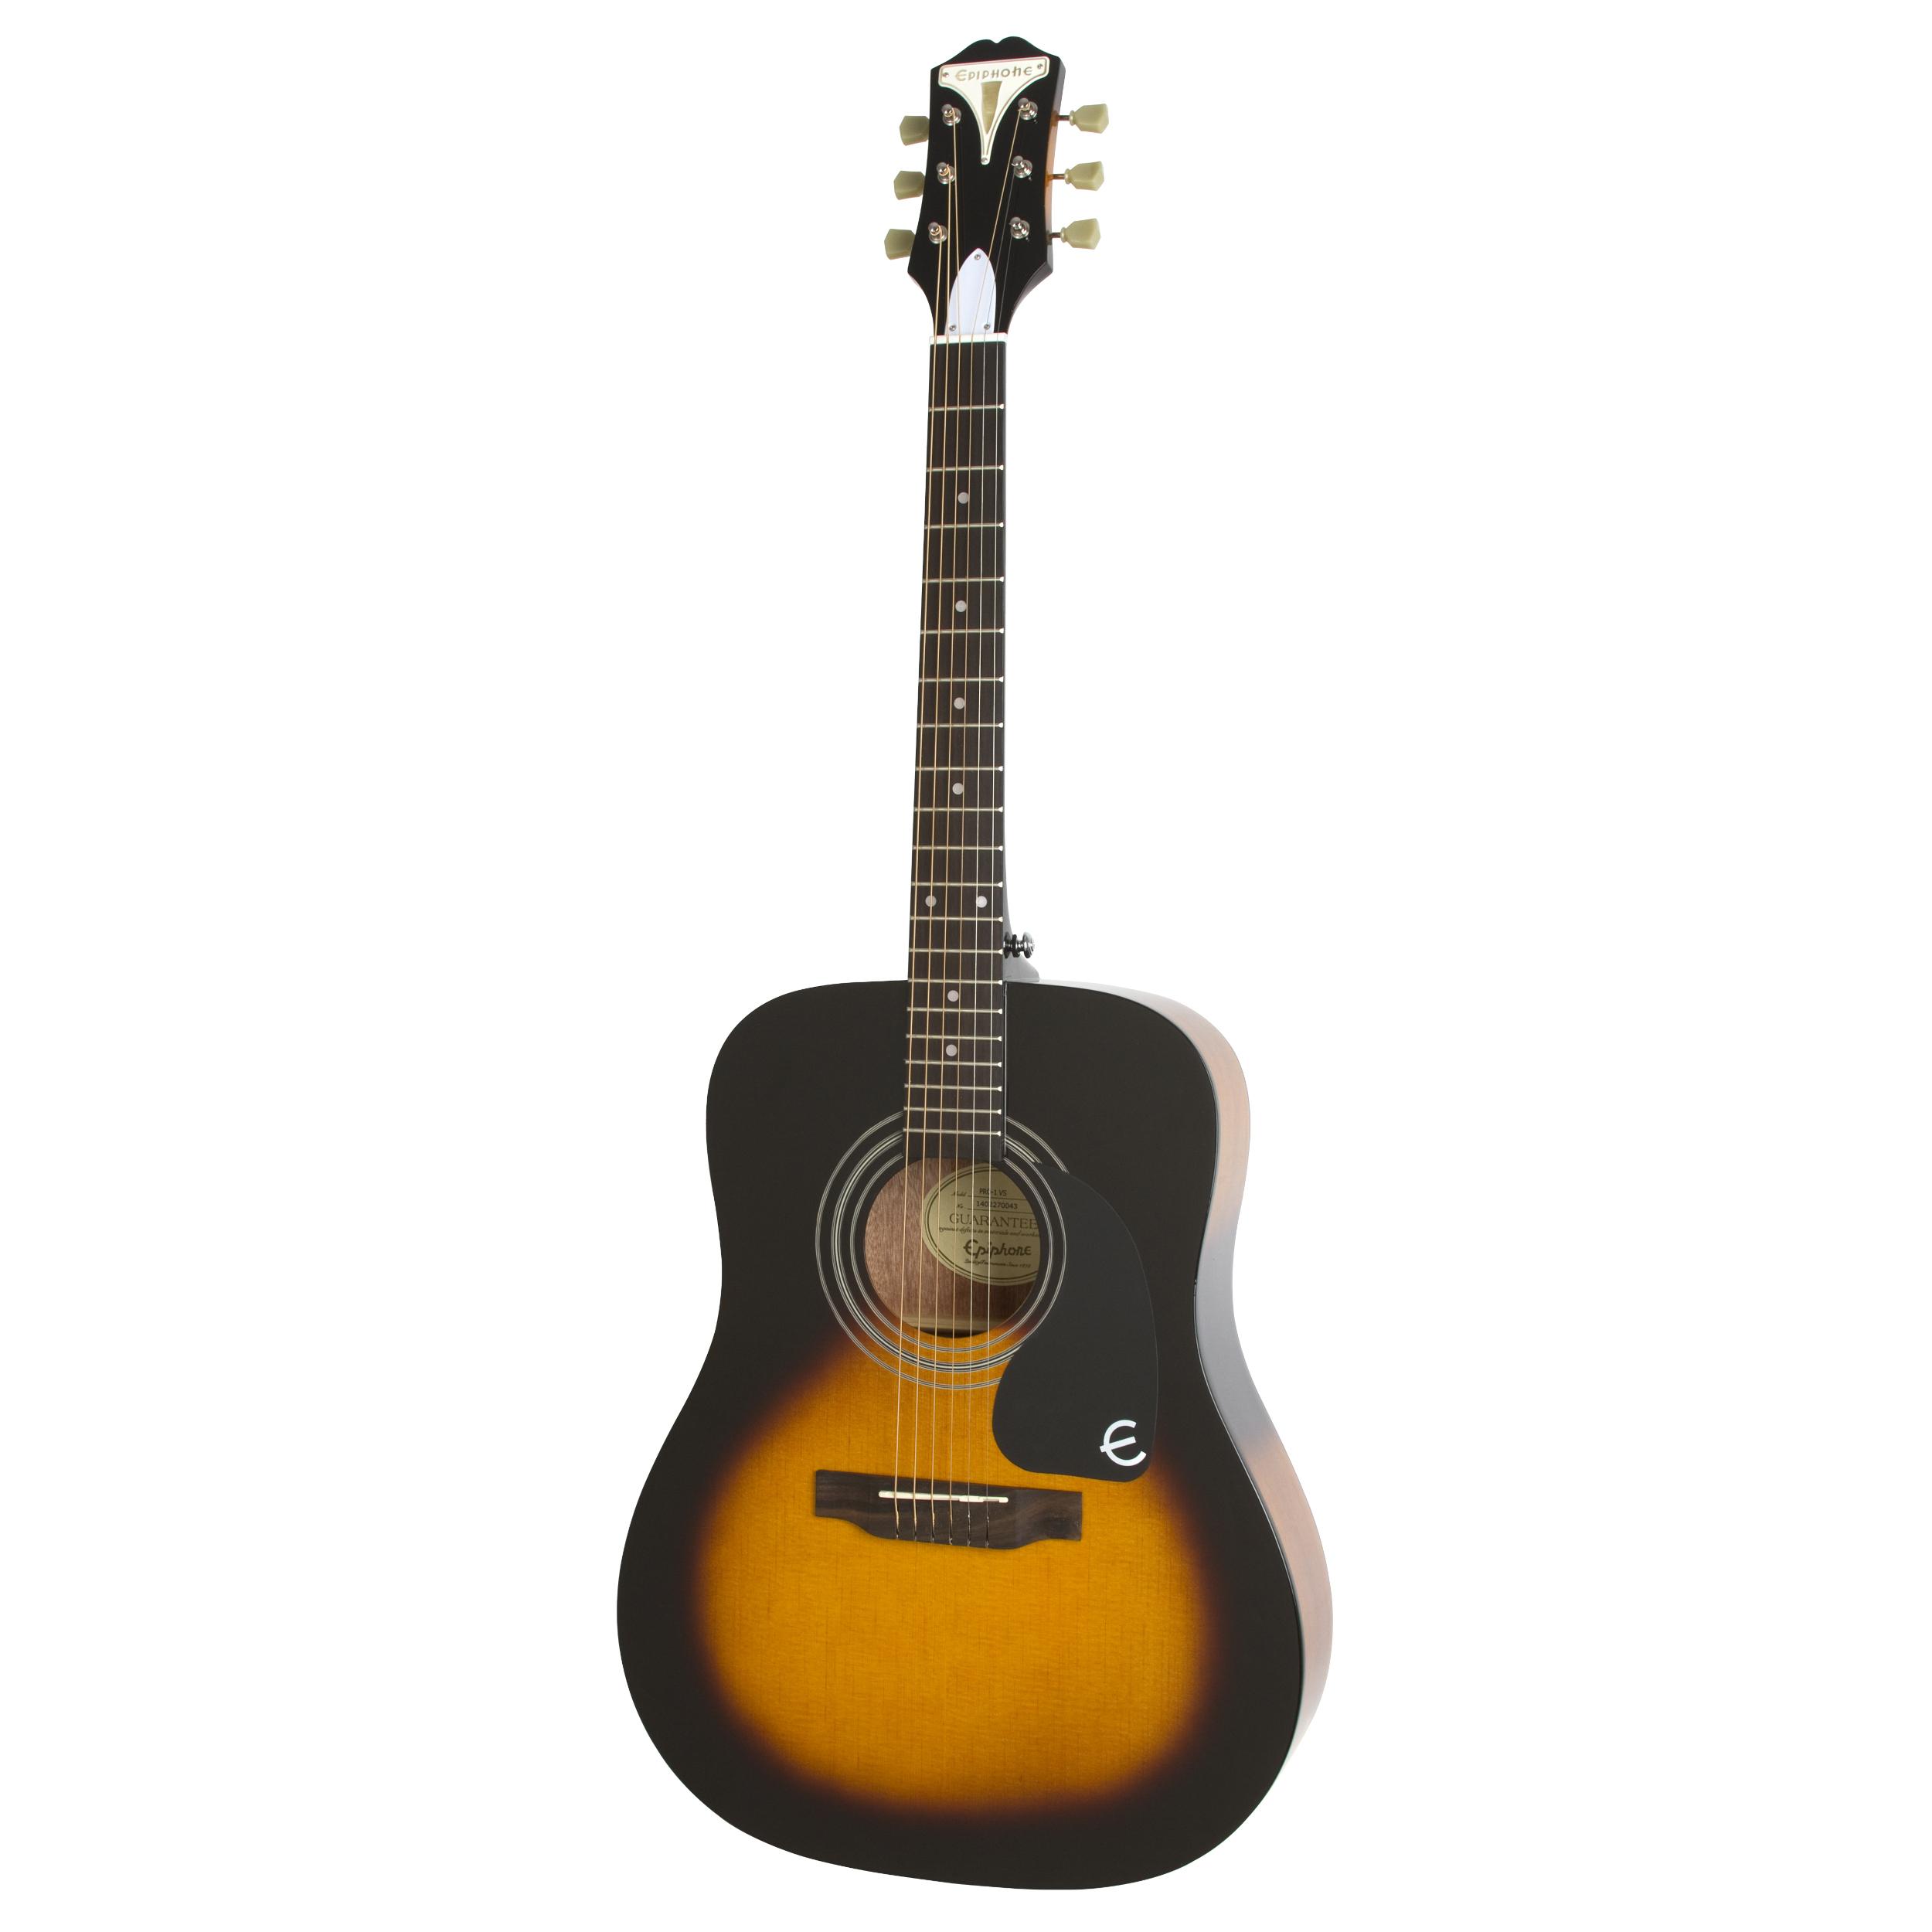 Epiphone PRO-1 - Vintage Sunburst Guitar